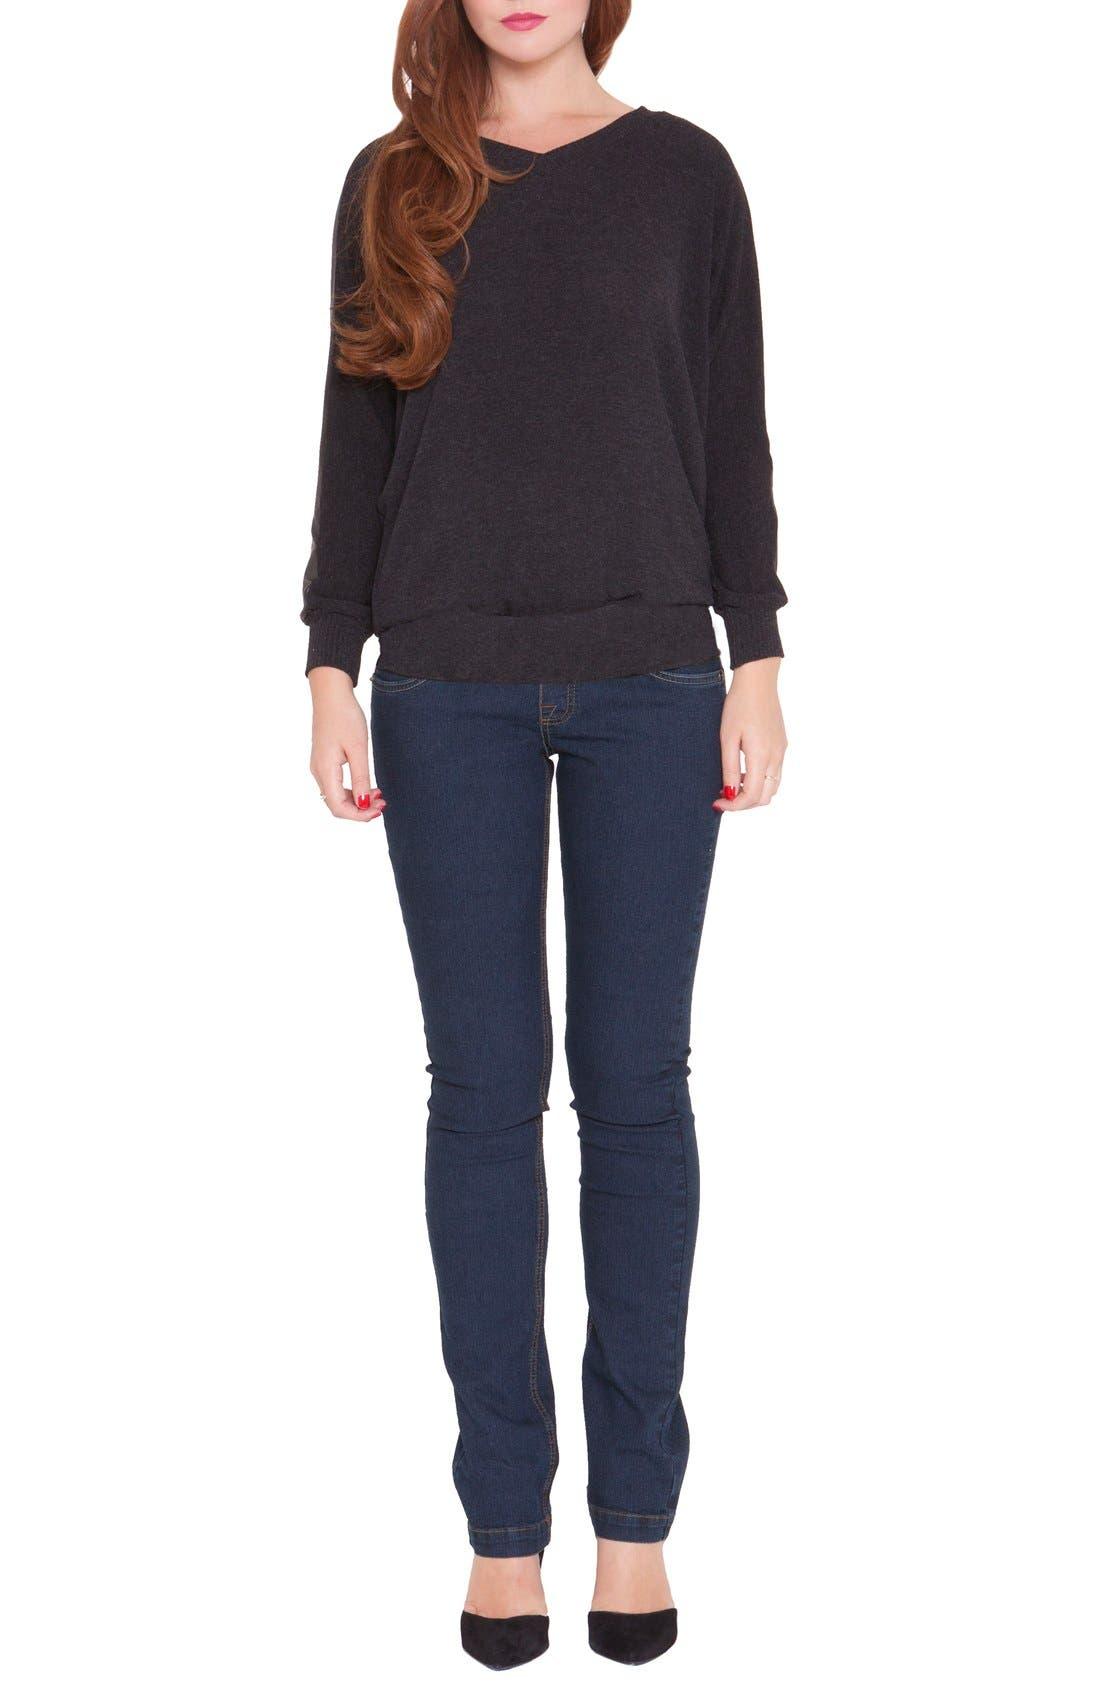 Olian 'Victoria' DolmanSleeveMaternity Sweatshirt